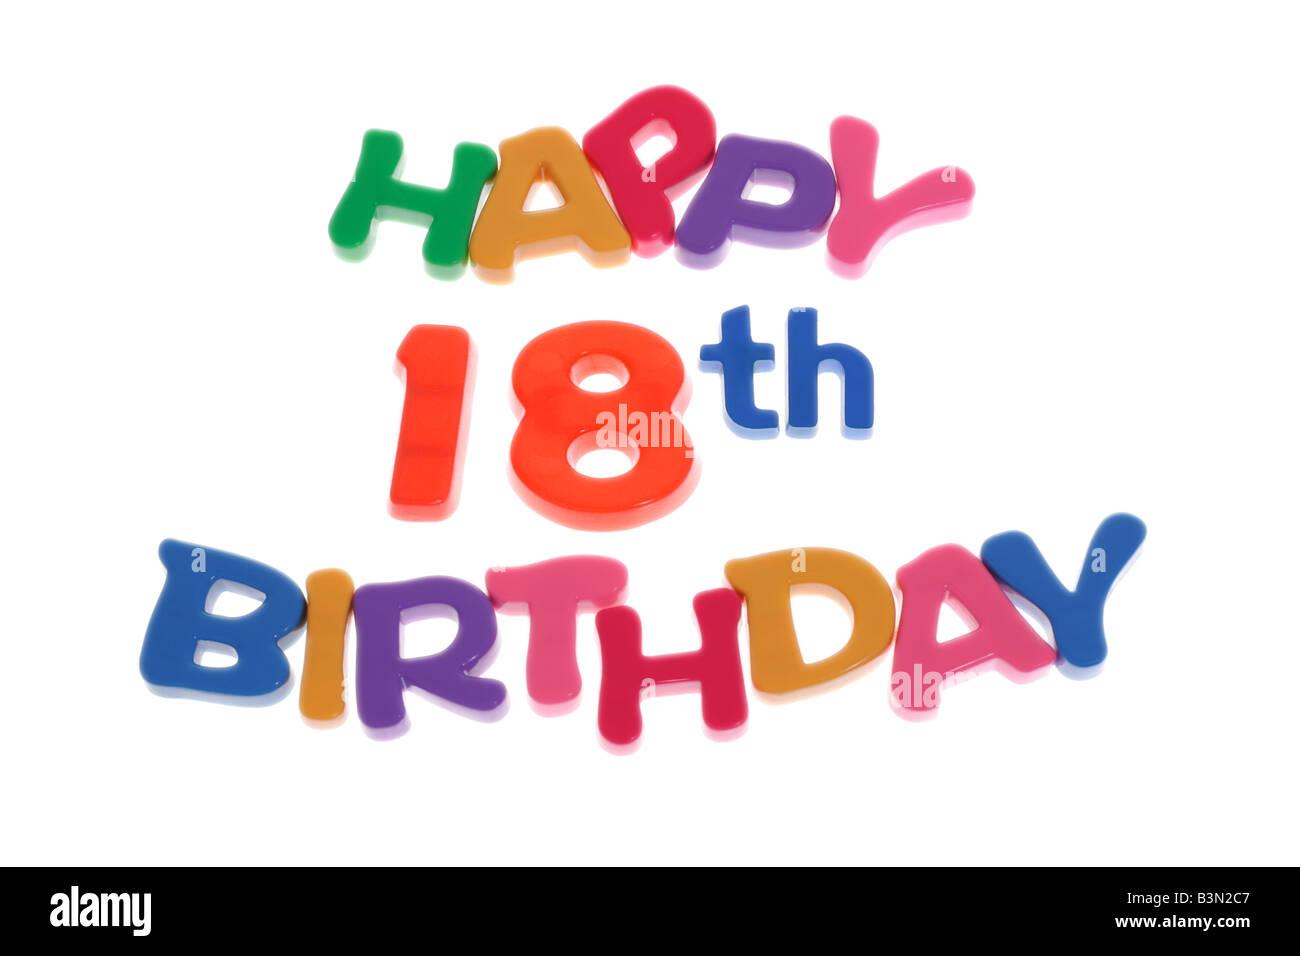 happy 18th birthday letter blocks arranged on white background